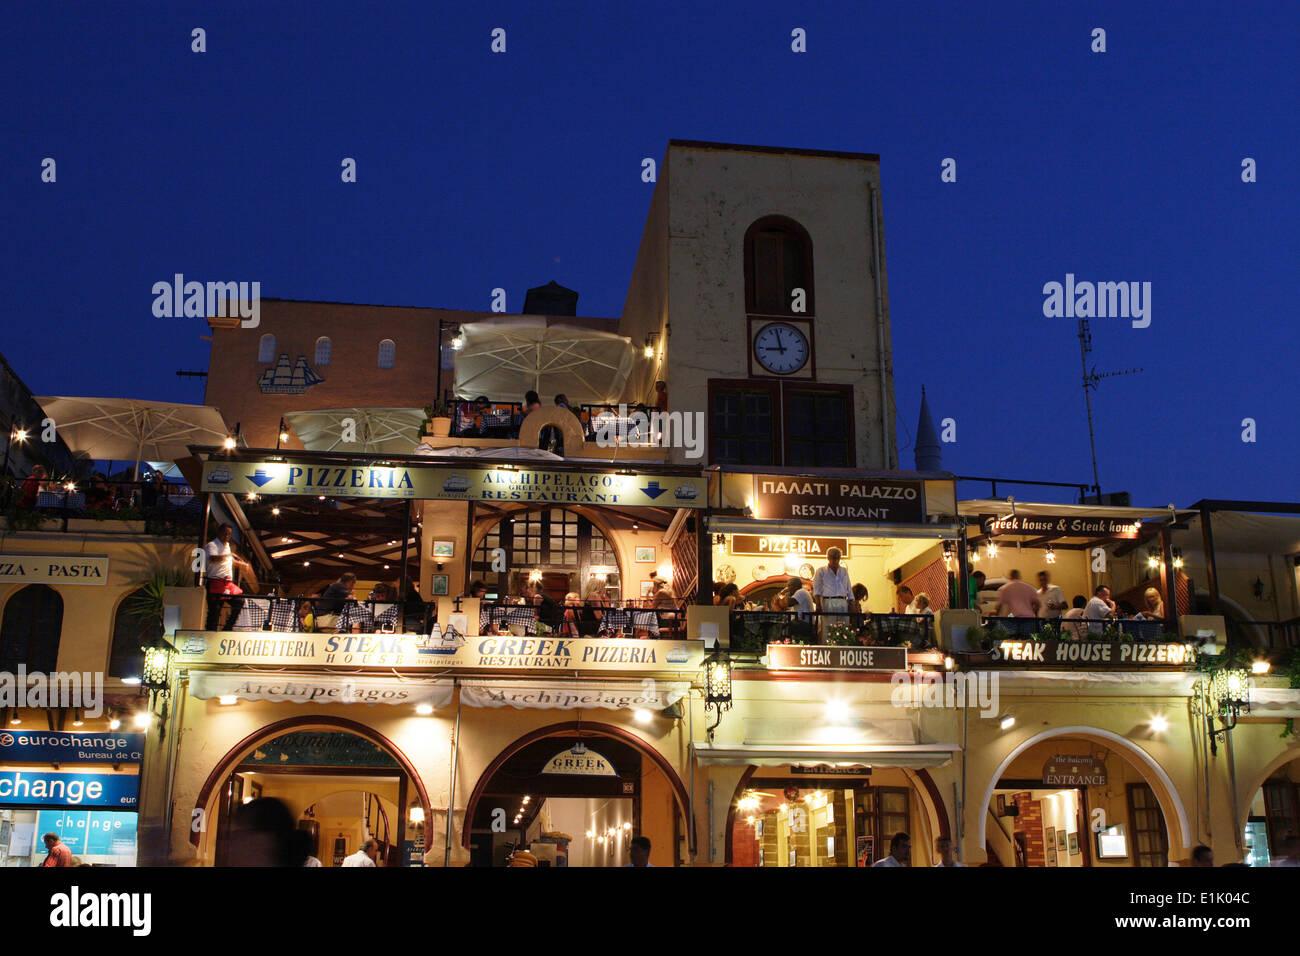 Gallery images and information kos greece nightlife - Filename Nightlife Rhodes Island Rhodes Town Greece E1k04c Jpg View Image